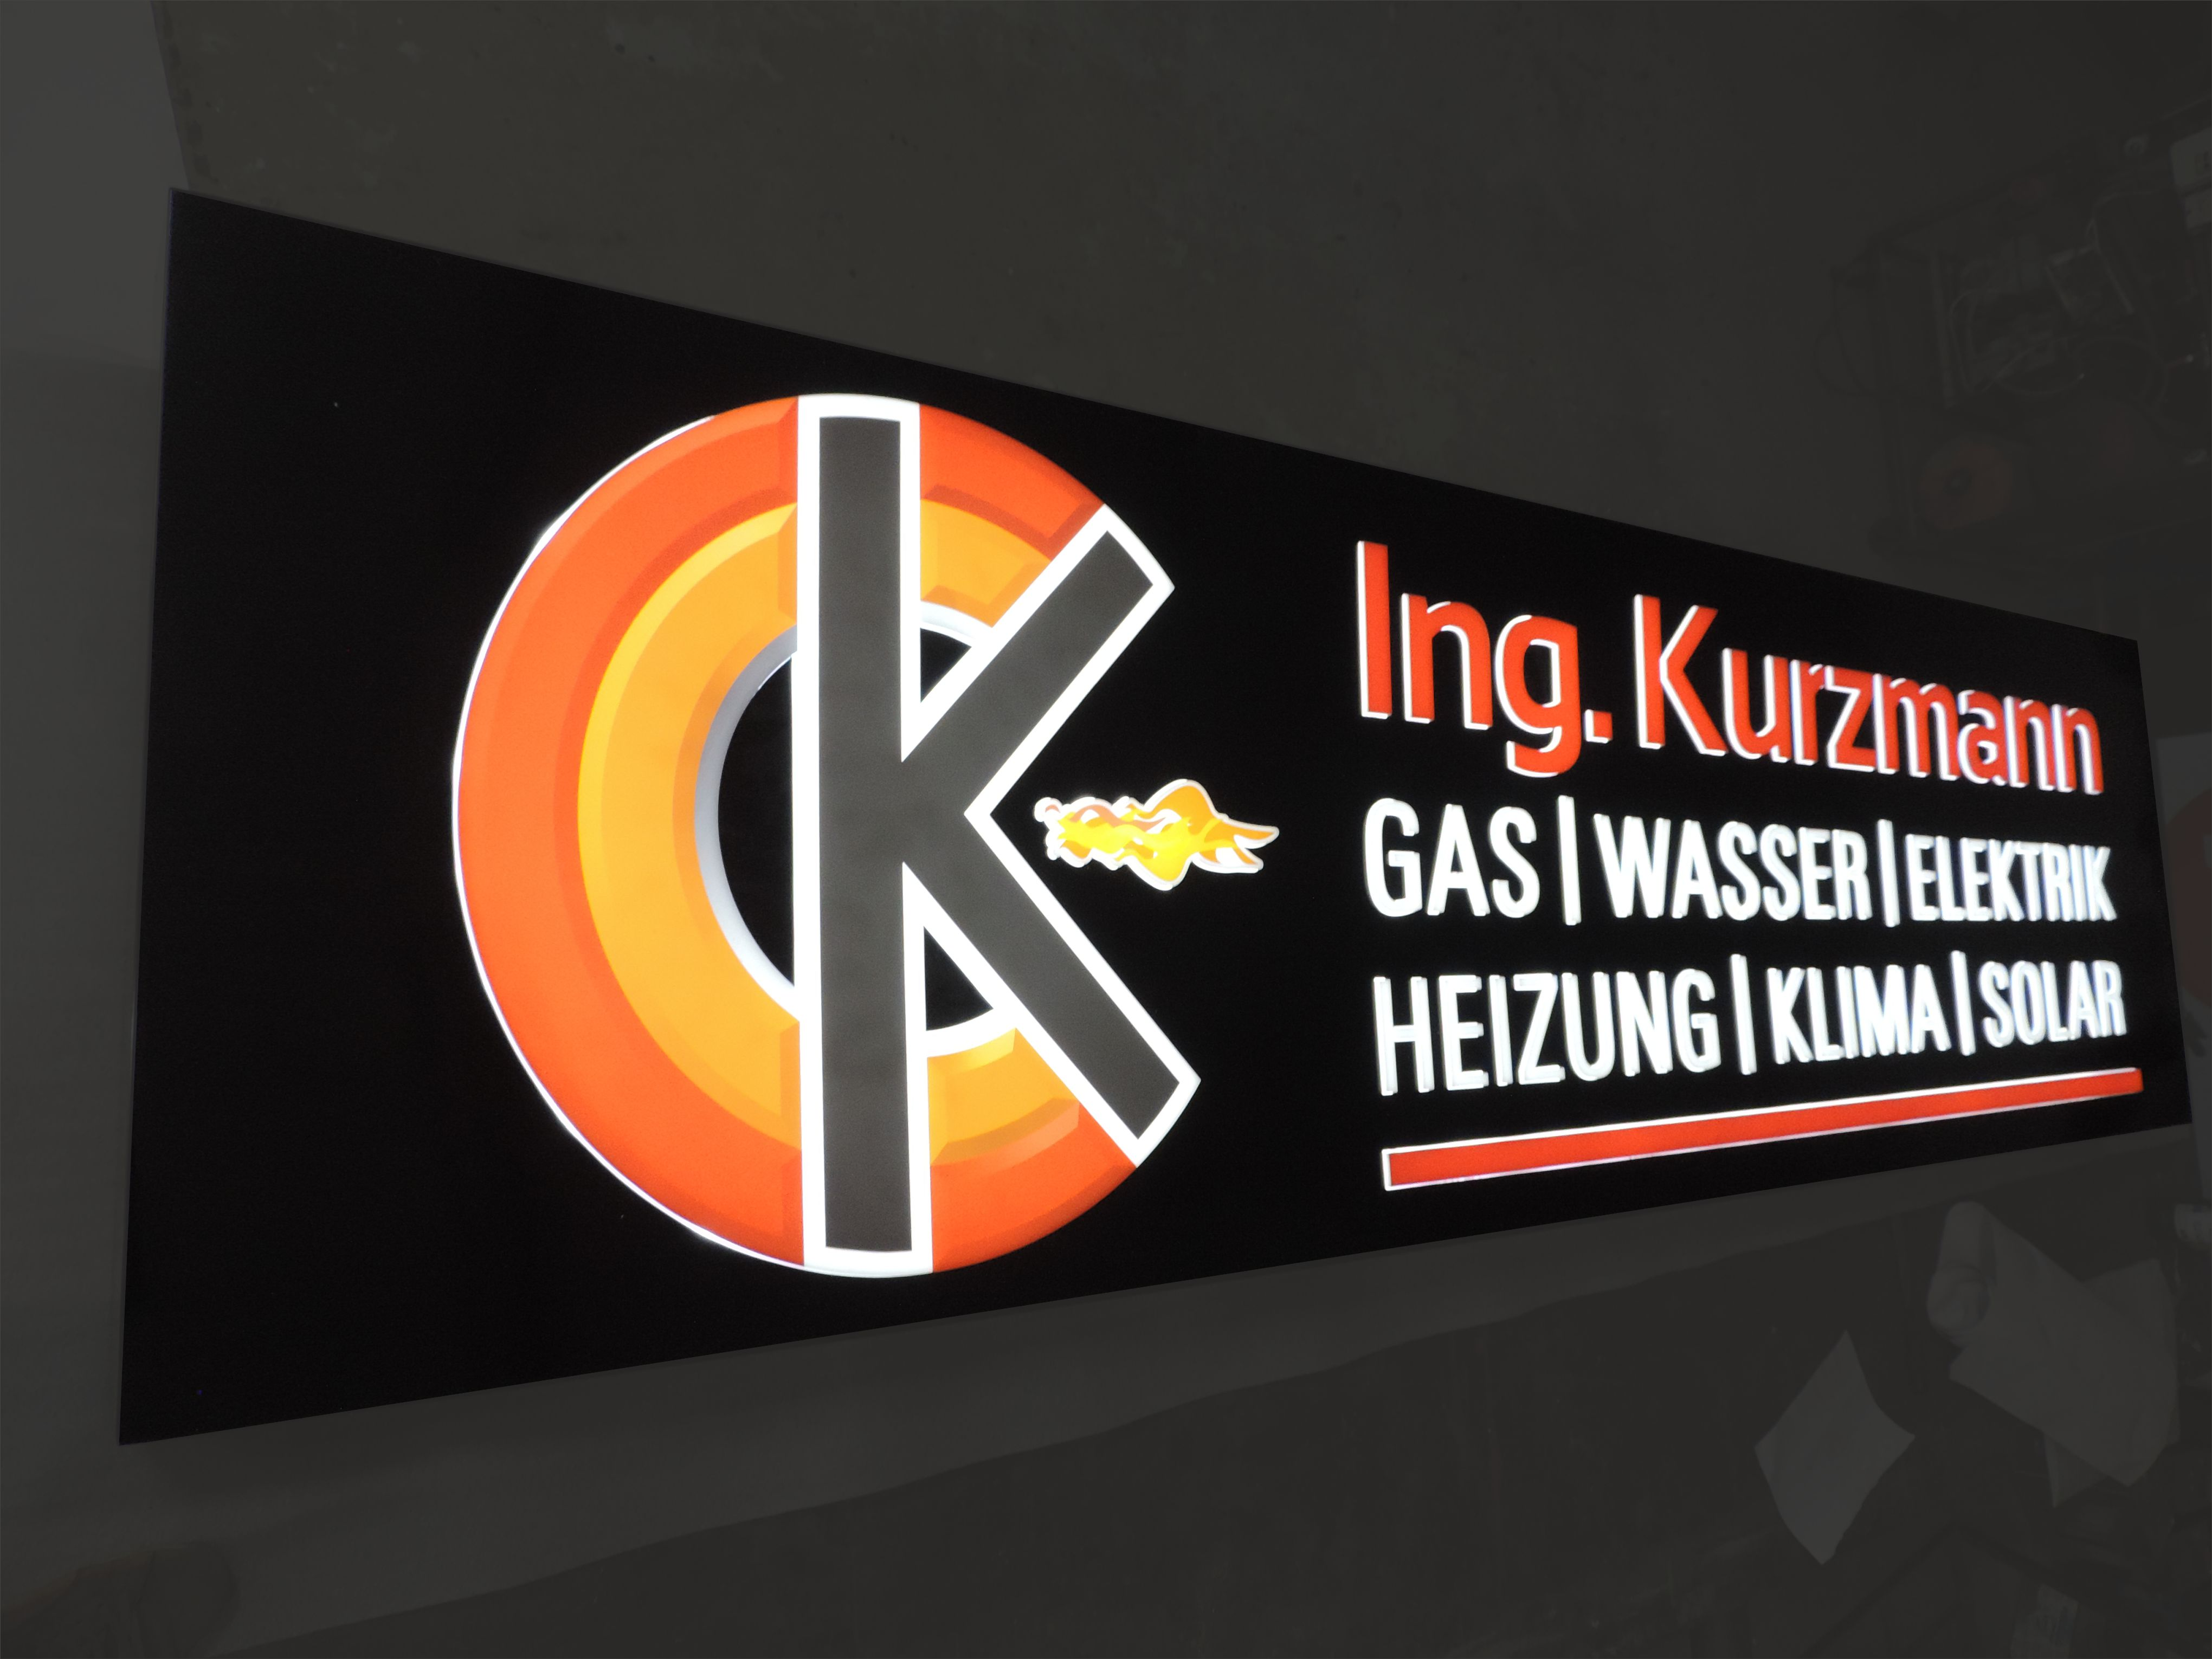 Ing. Kurzmann